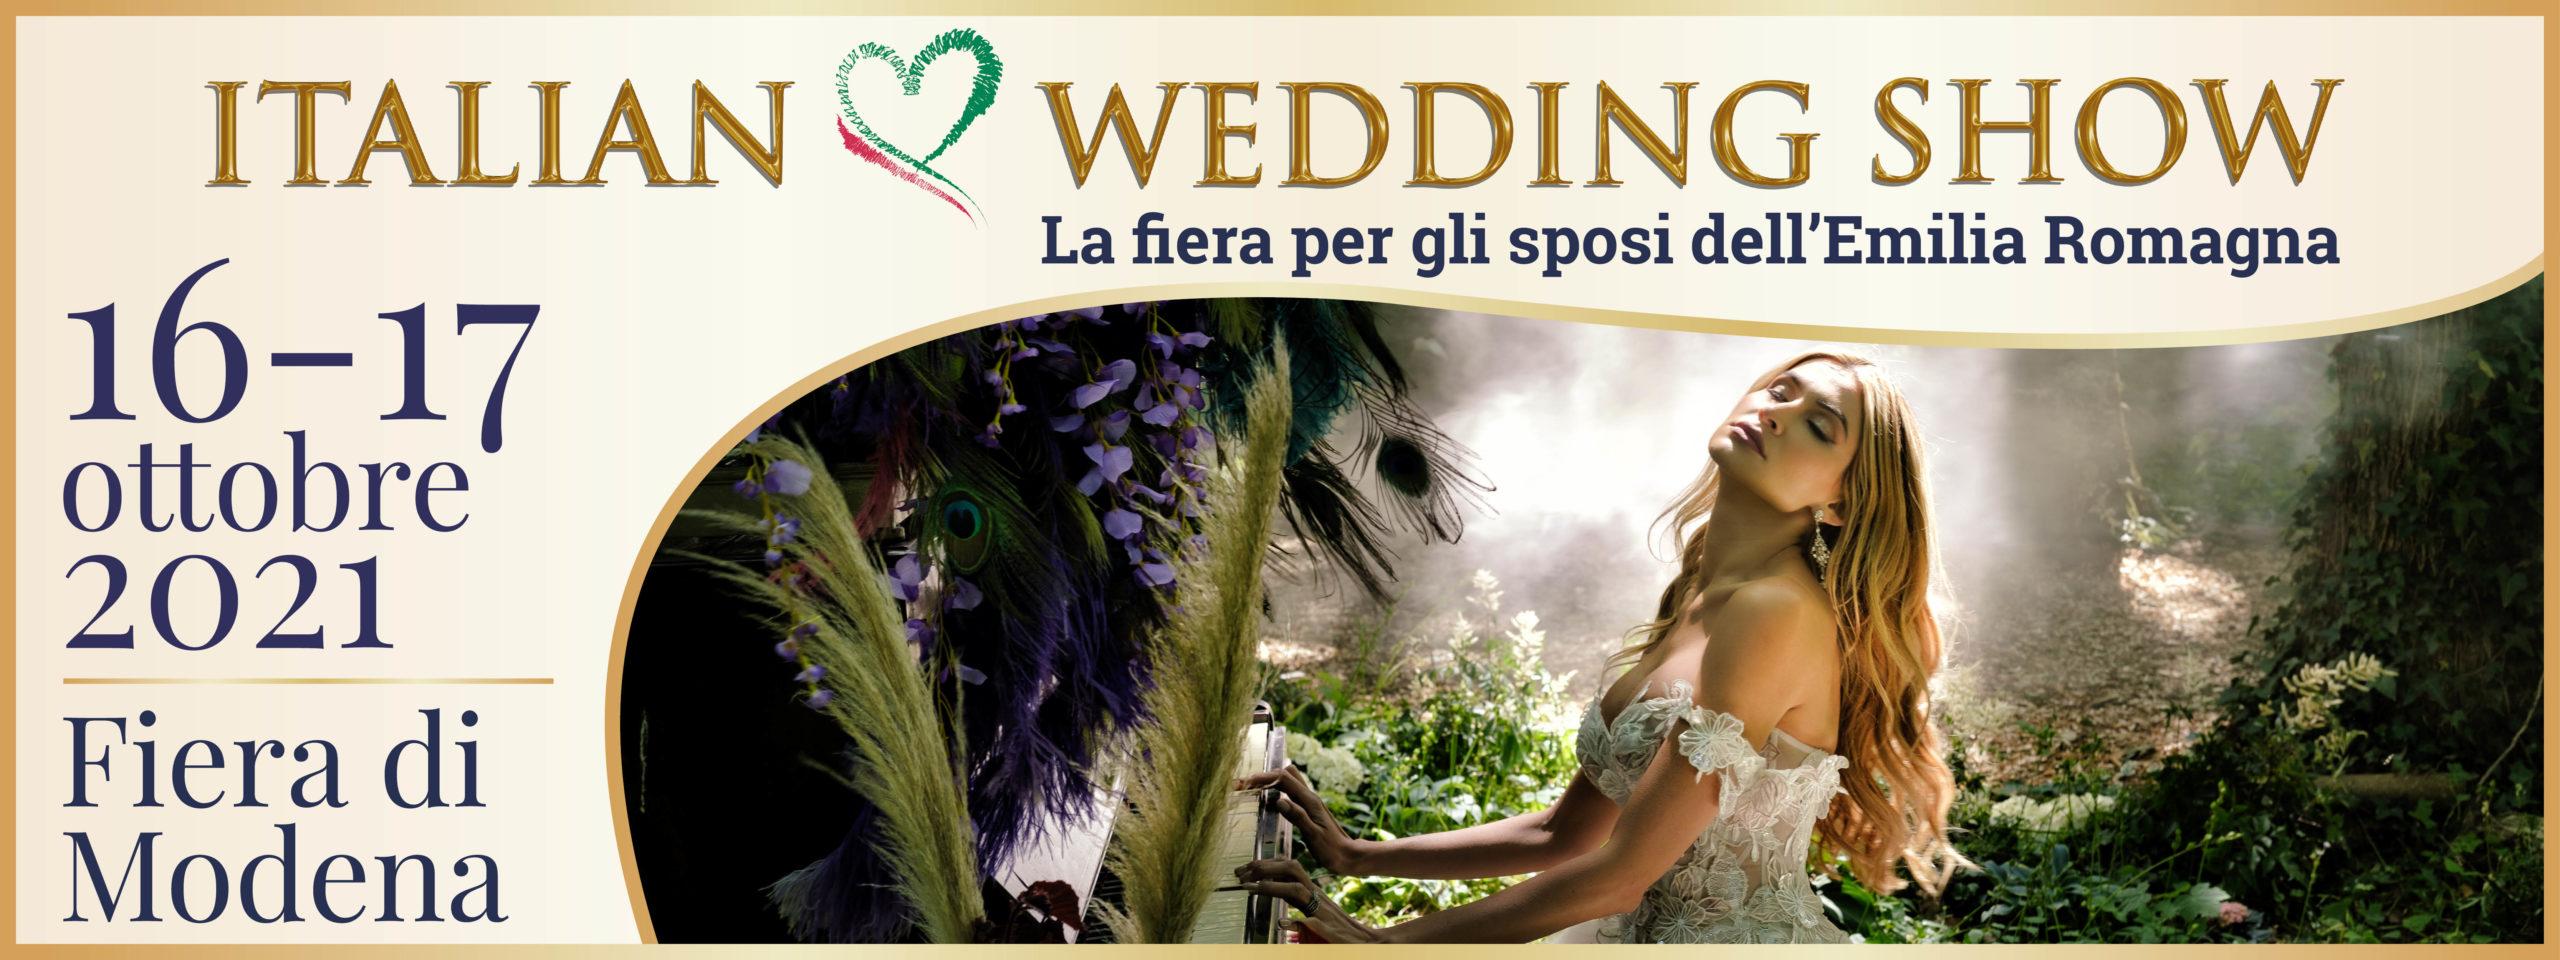 Italian Wedding Show